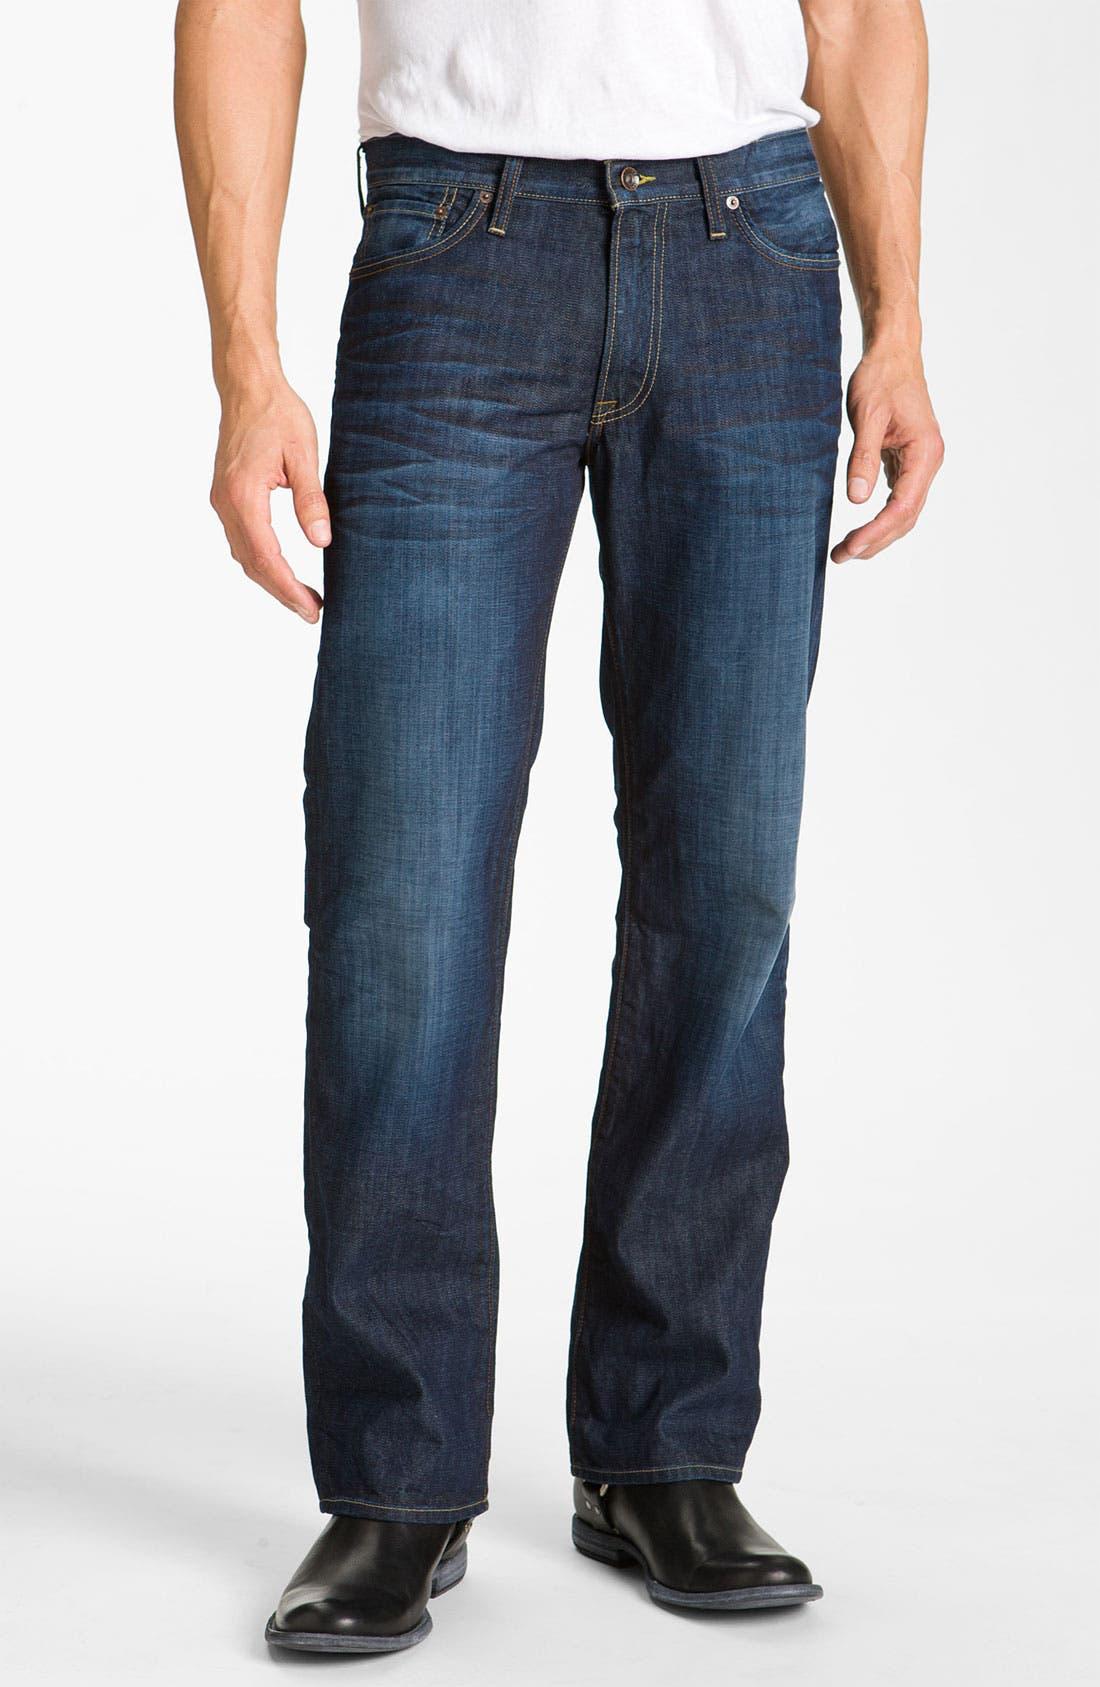 Main Image - Lucky Brand '361 Vintage' Straight Leg Jeans (Dark Creek)